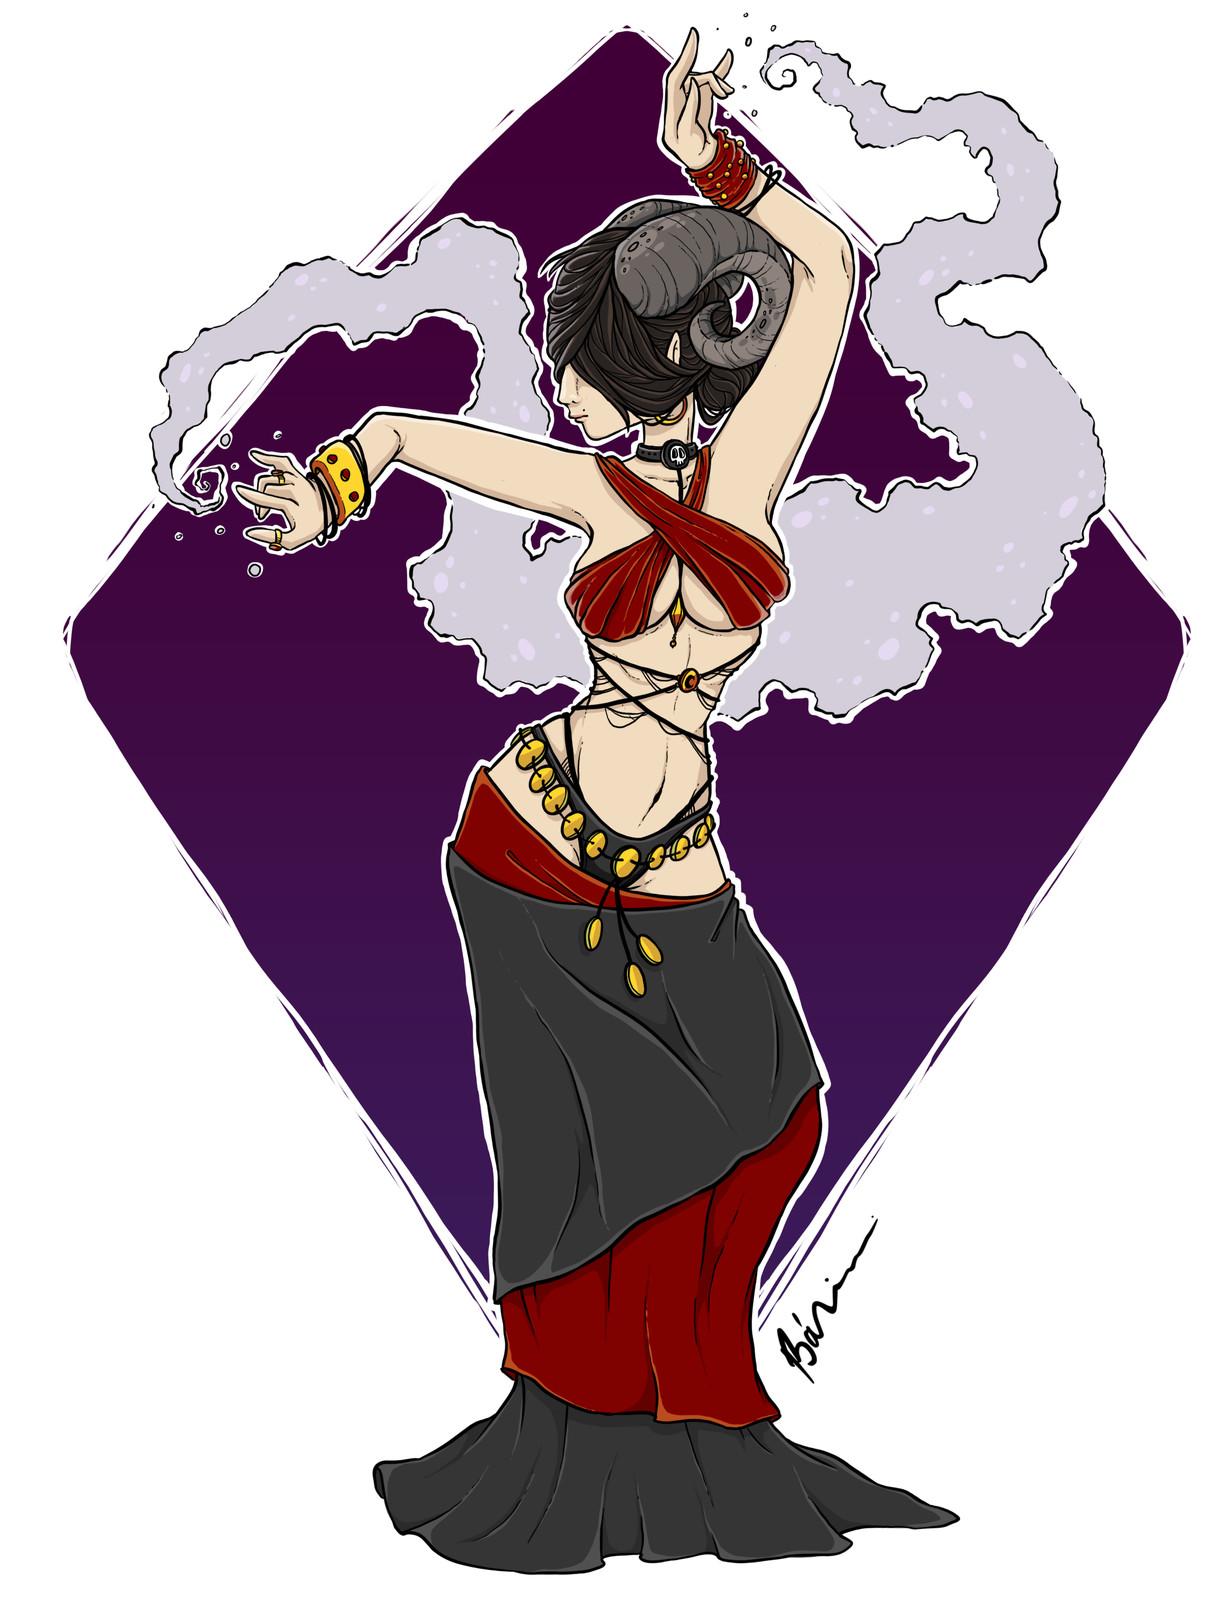 The summoning dance finished digital character illustration